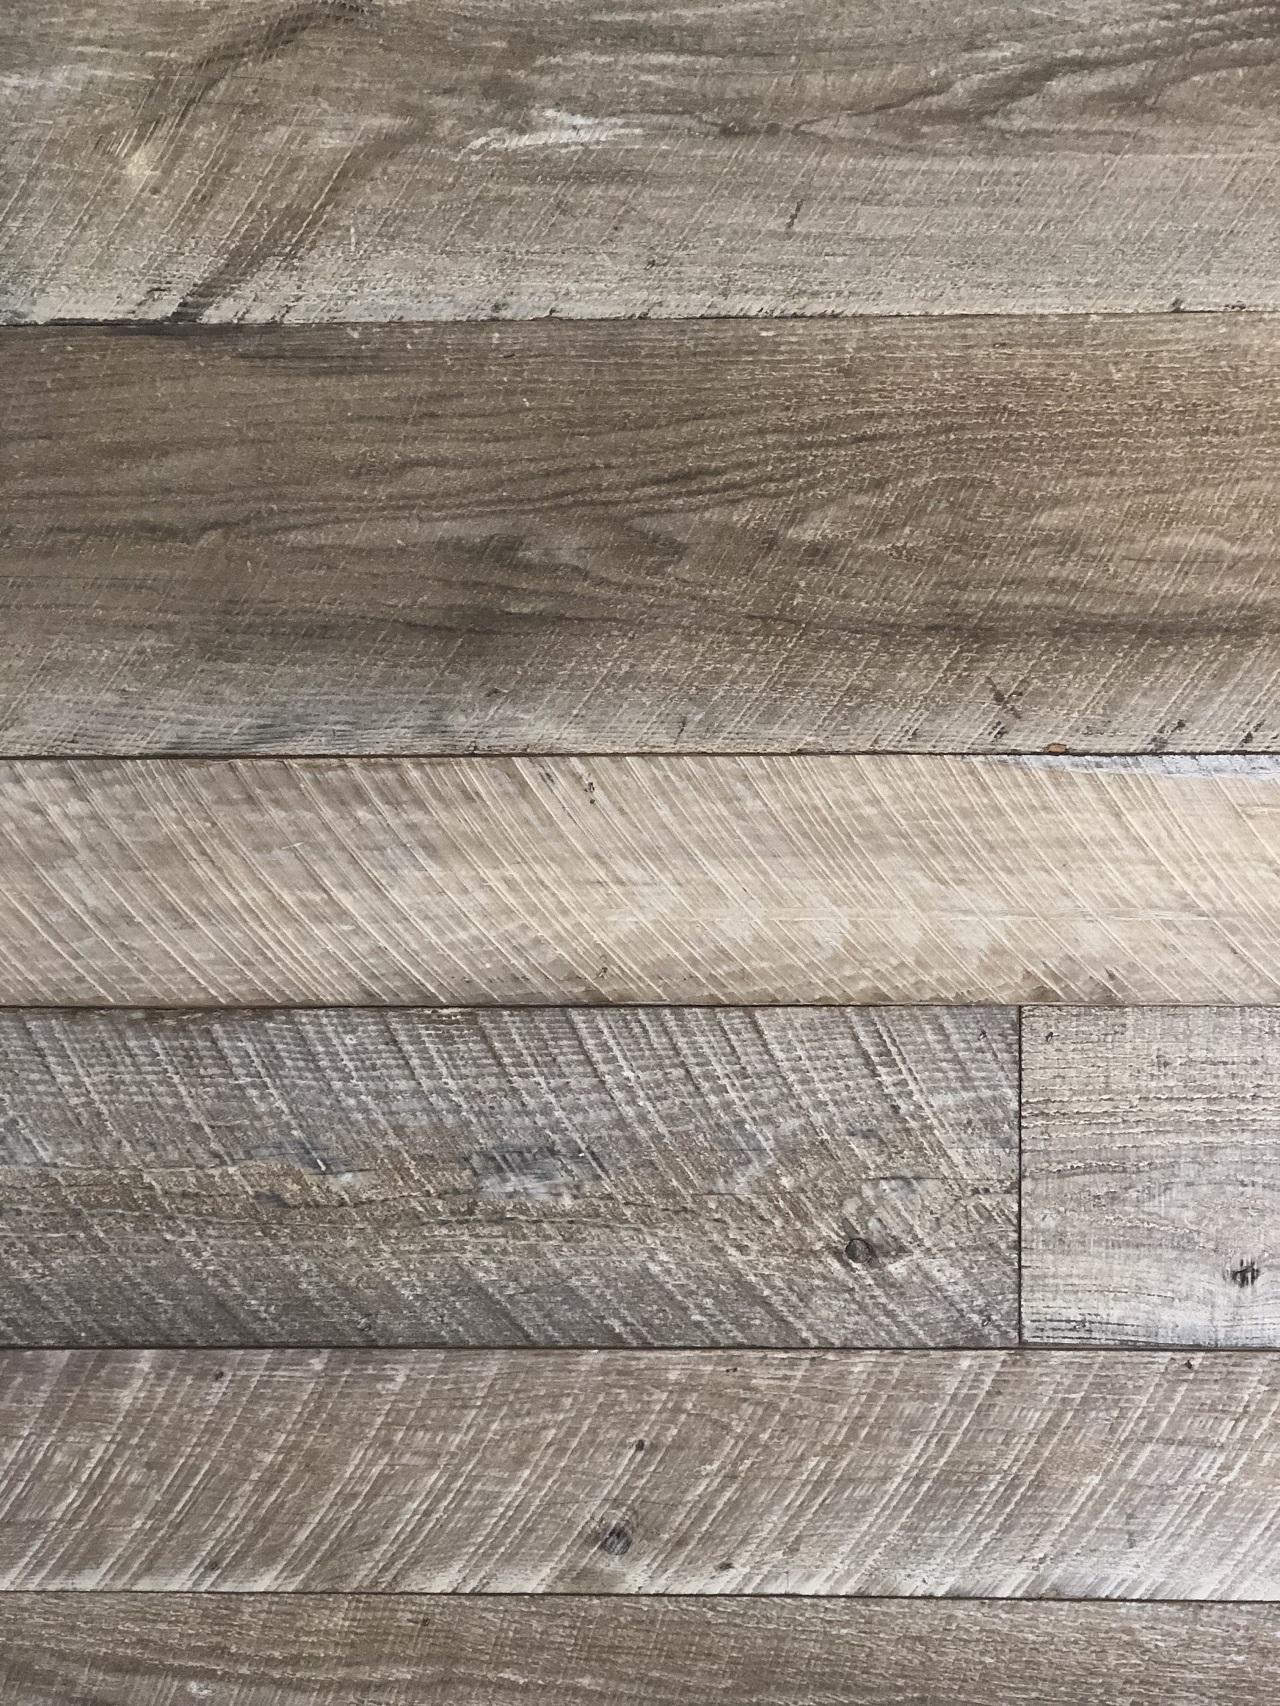 Wood Siding Dain S Lumber Westchester Putnam Dutchess Counties